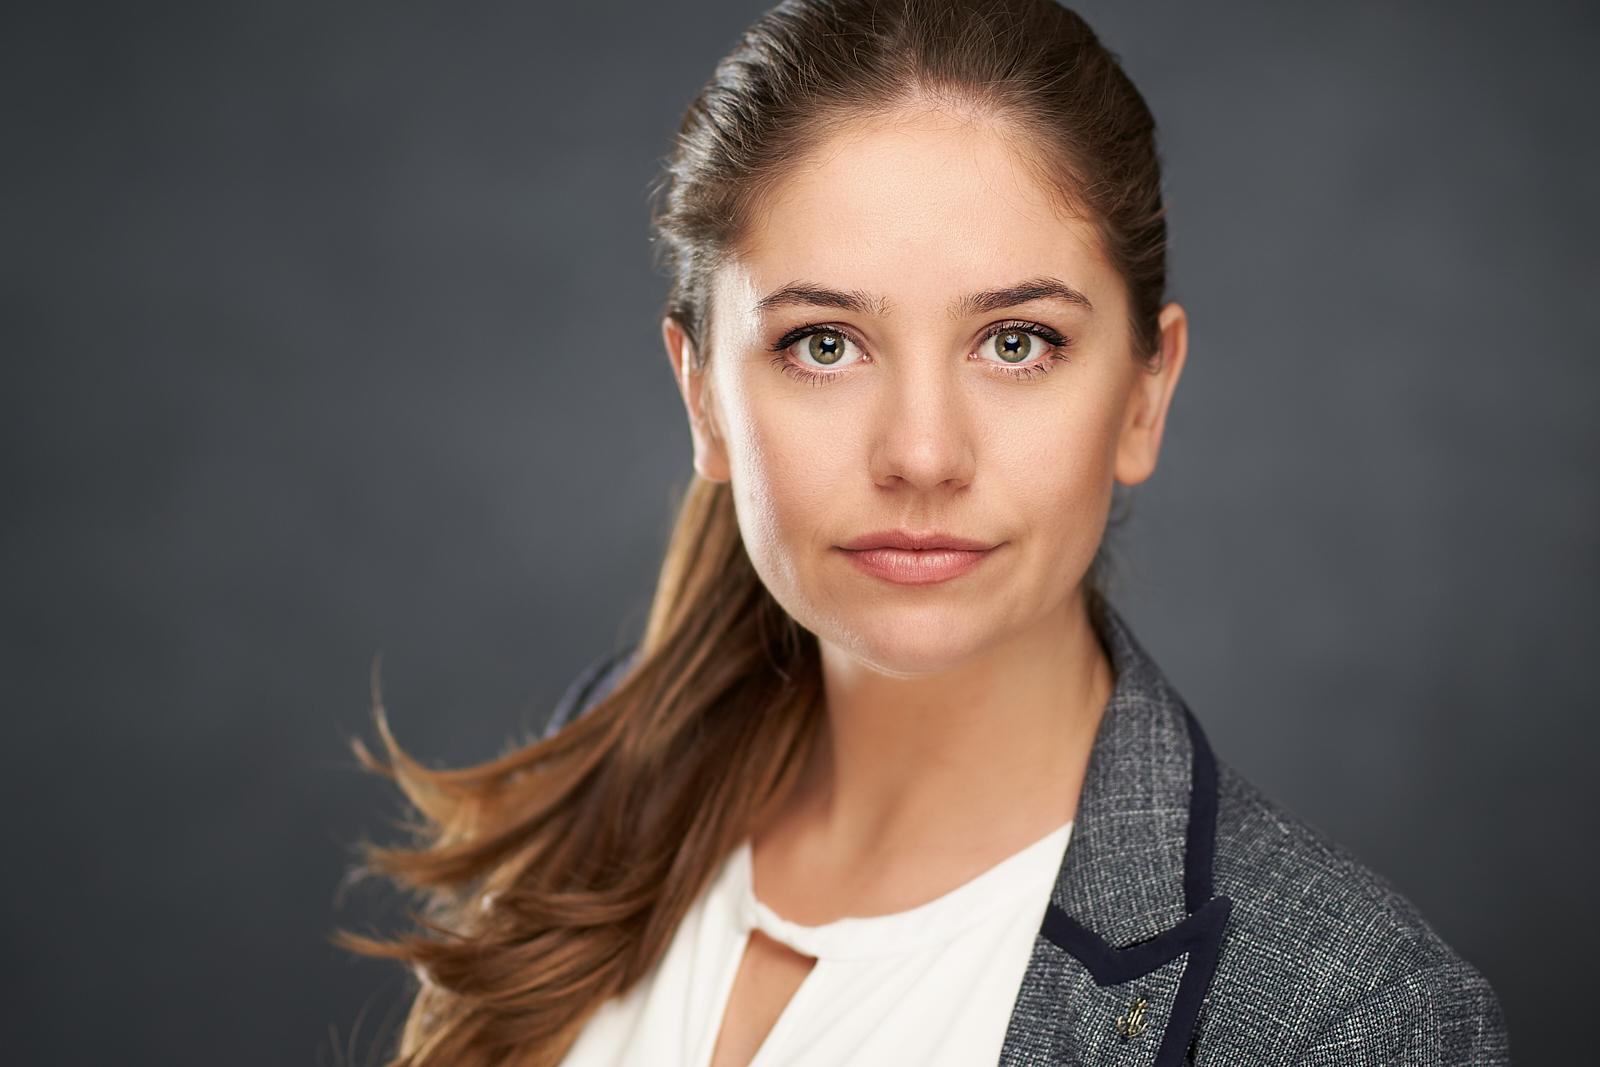 WEB-Kalispell-Headshots-2019-01-31 Jenny Nygren Headshot7495 2.jpg